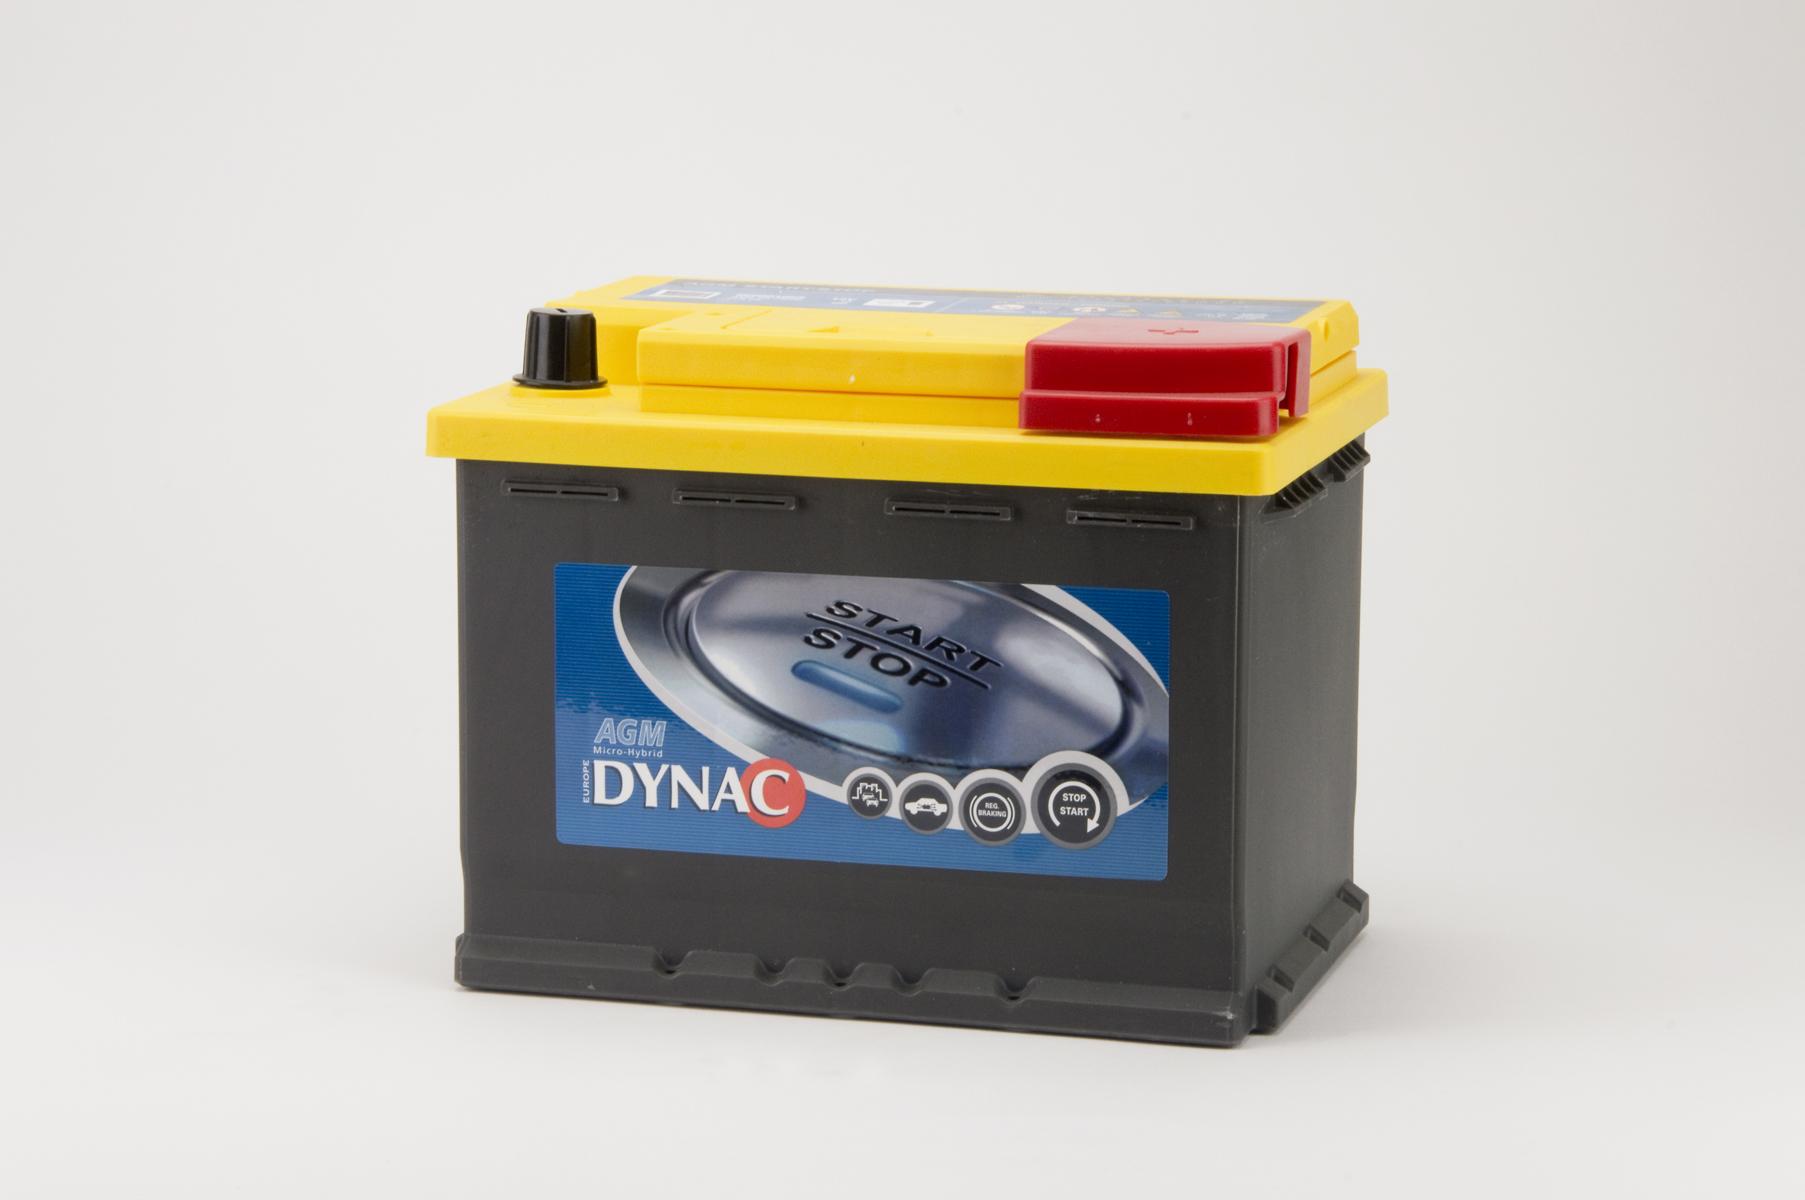 Dynac AGM Start-Stop accu (12V 60Ah)